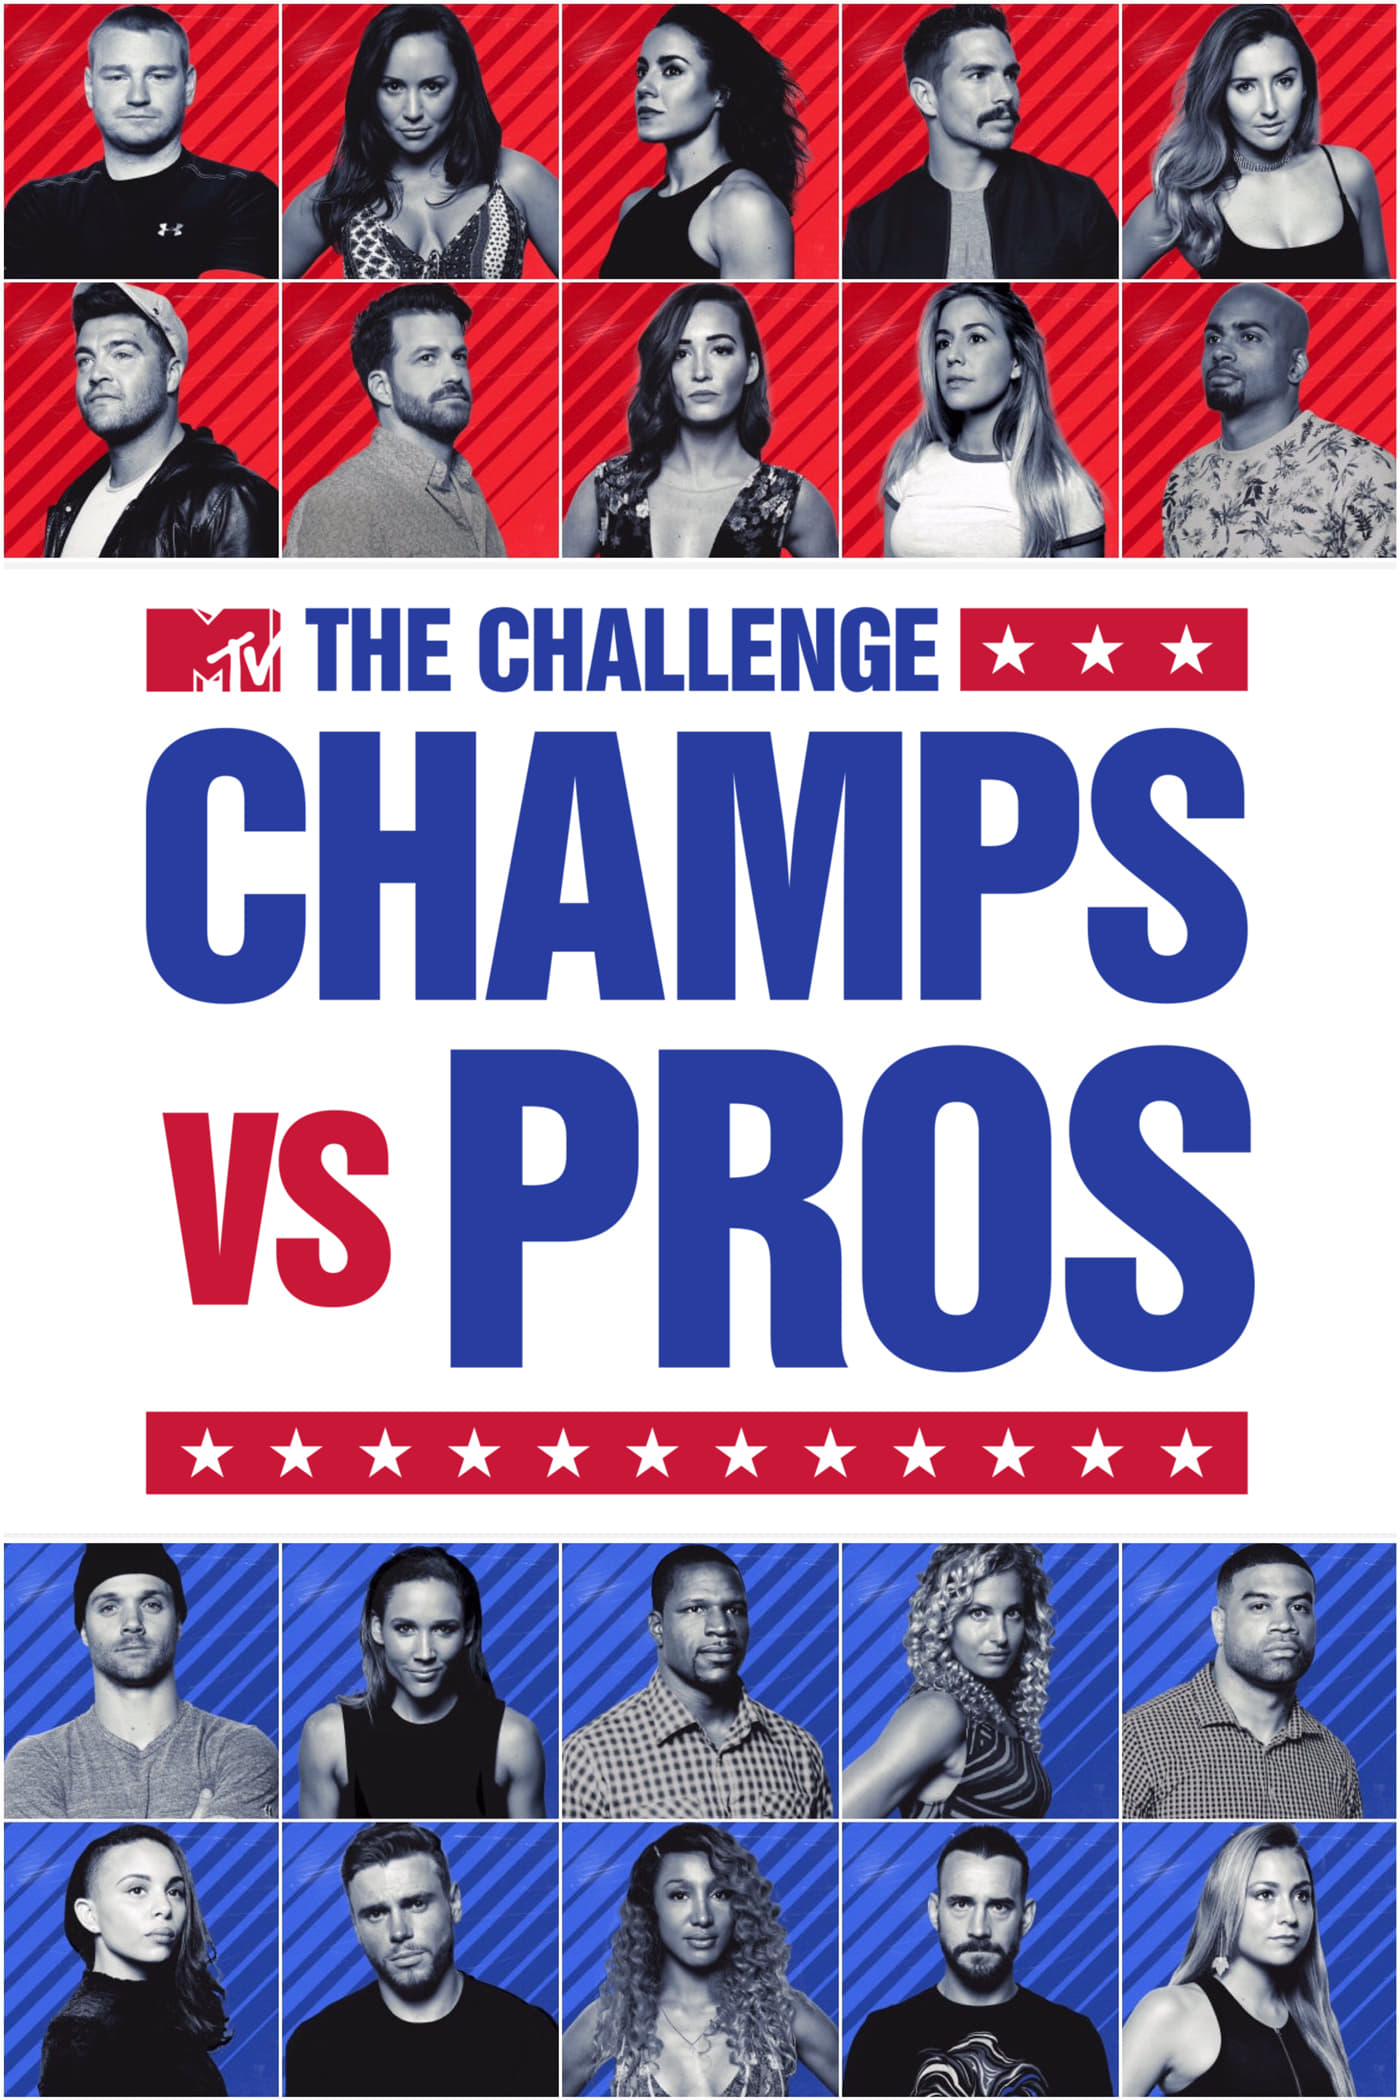 The Challenge: Champs vs. Pros